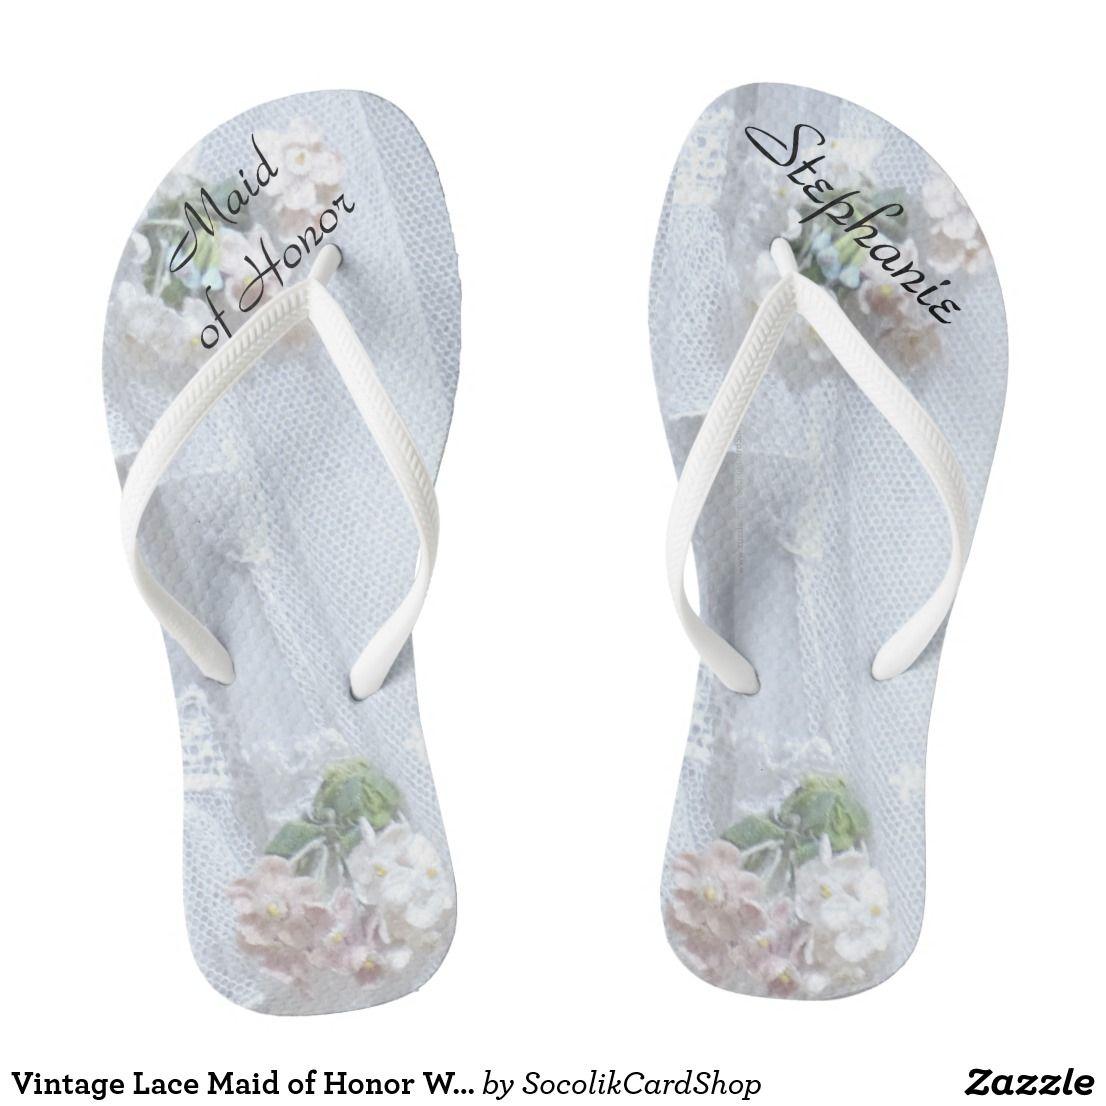 810c06c4bc0da Vintage Lace Maid of Honor Wedding Flip Flops